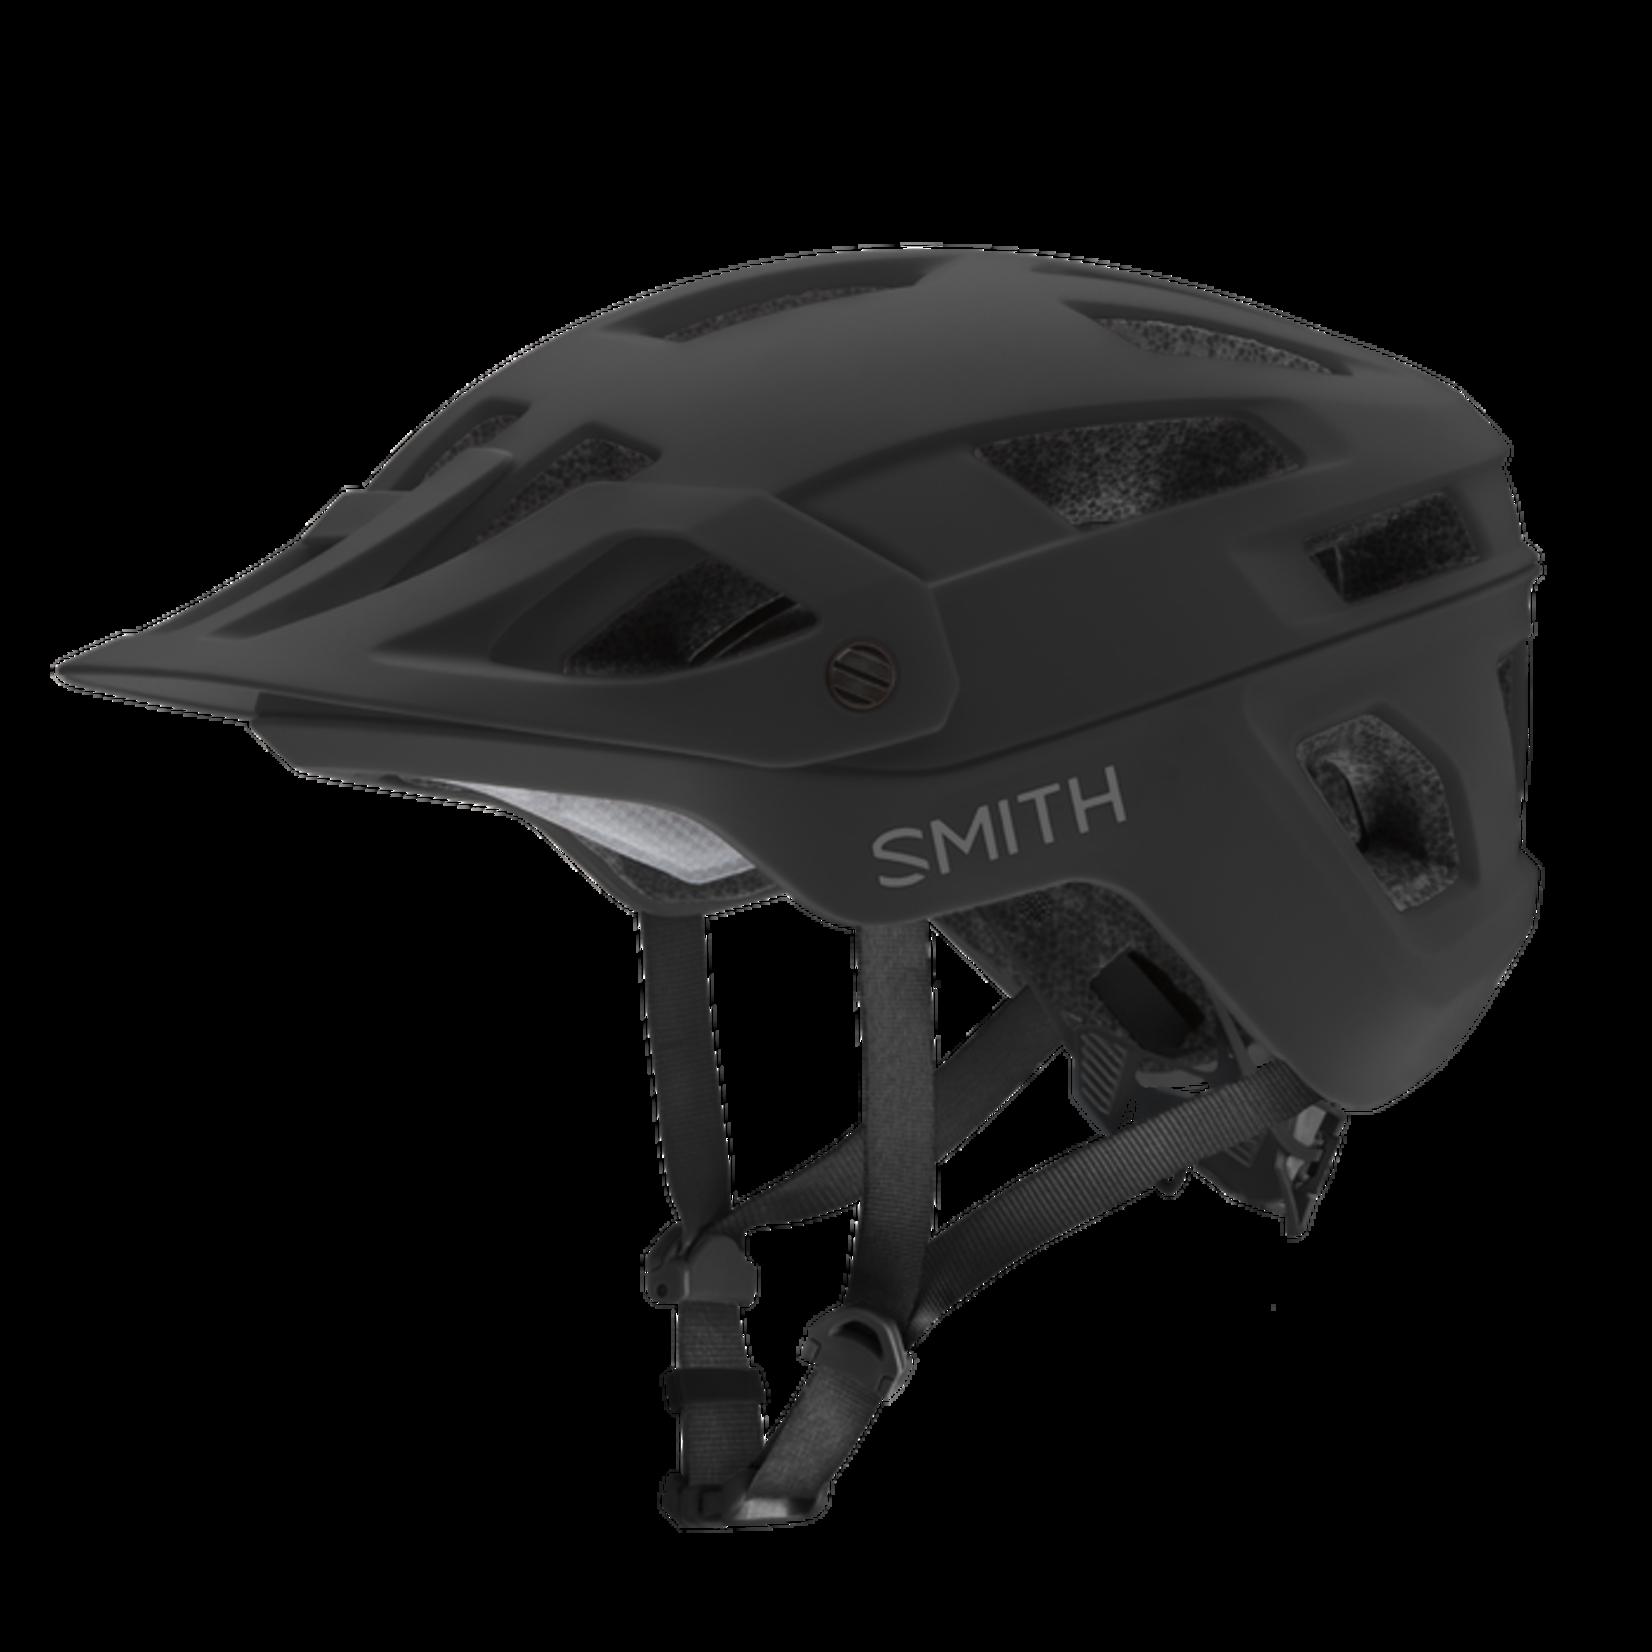 Smith Optics ENGAGE MIPS MT BLK 61 65